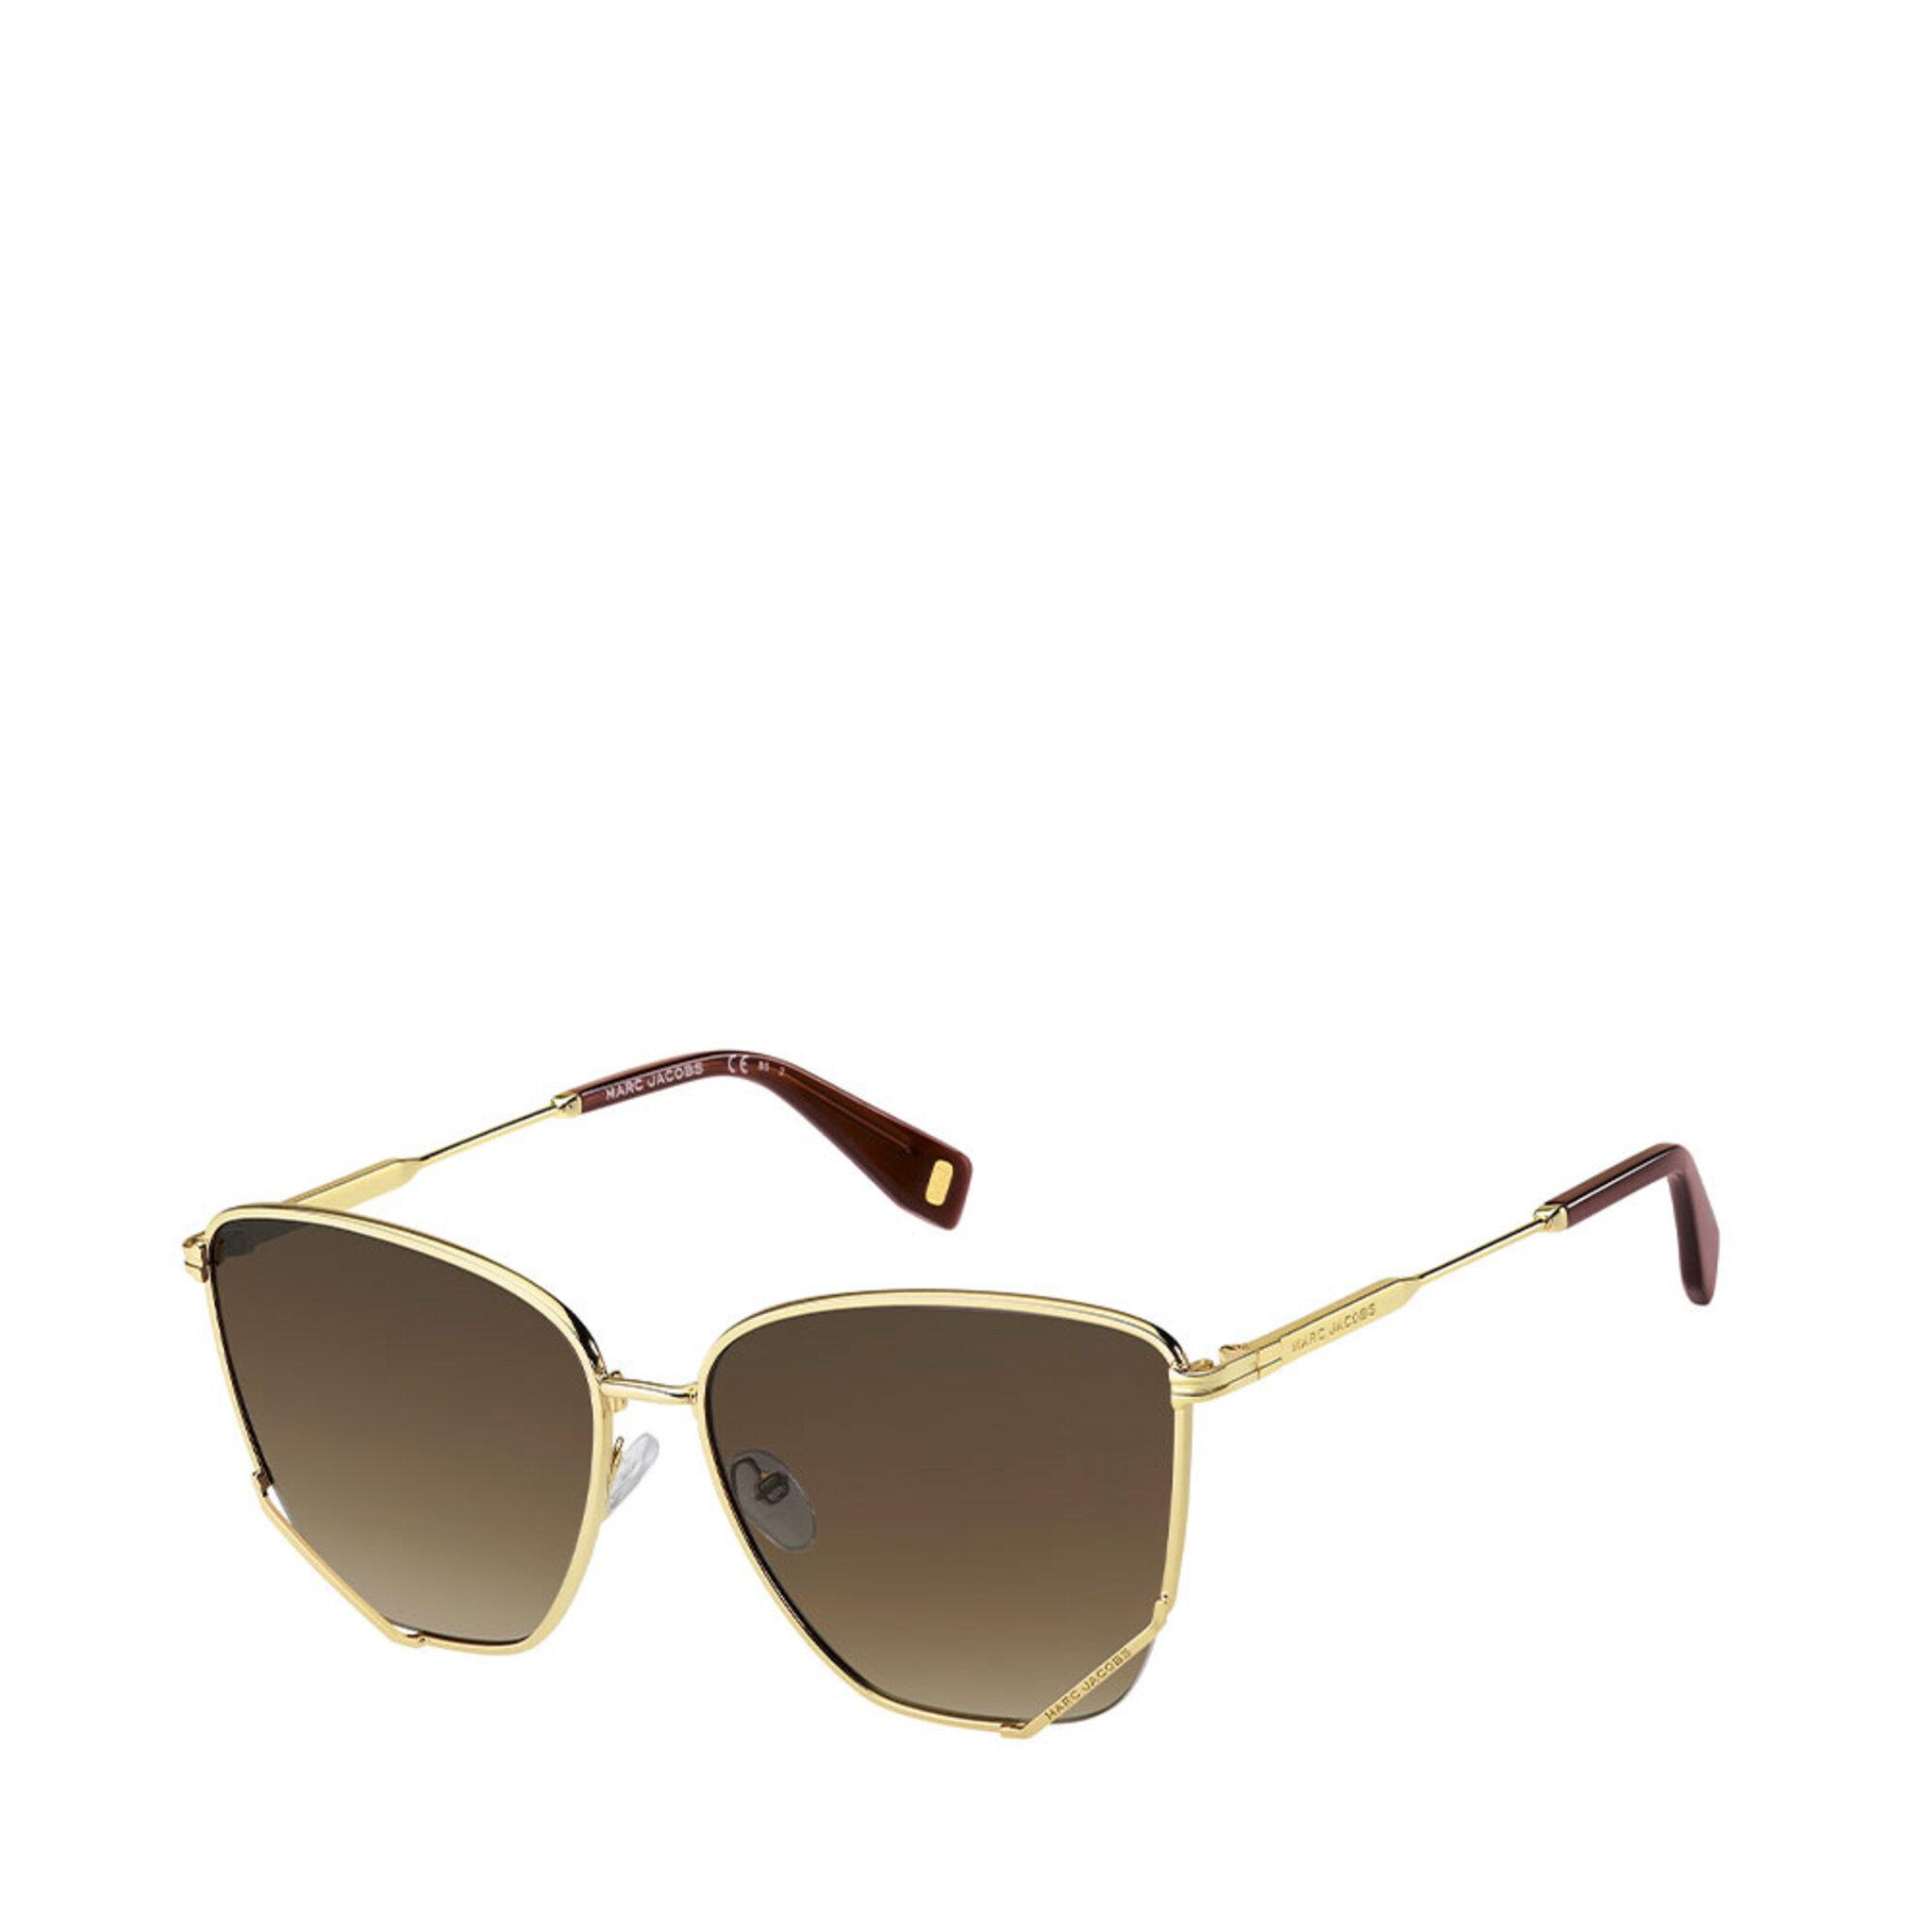 Sunglasses MJ 1006/S